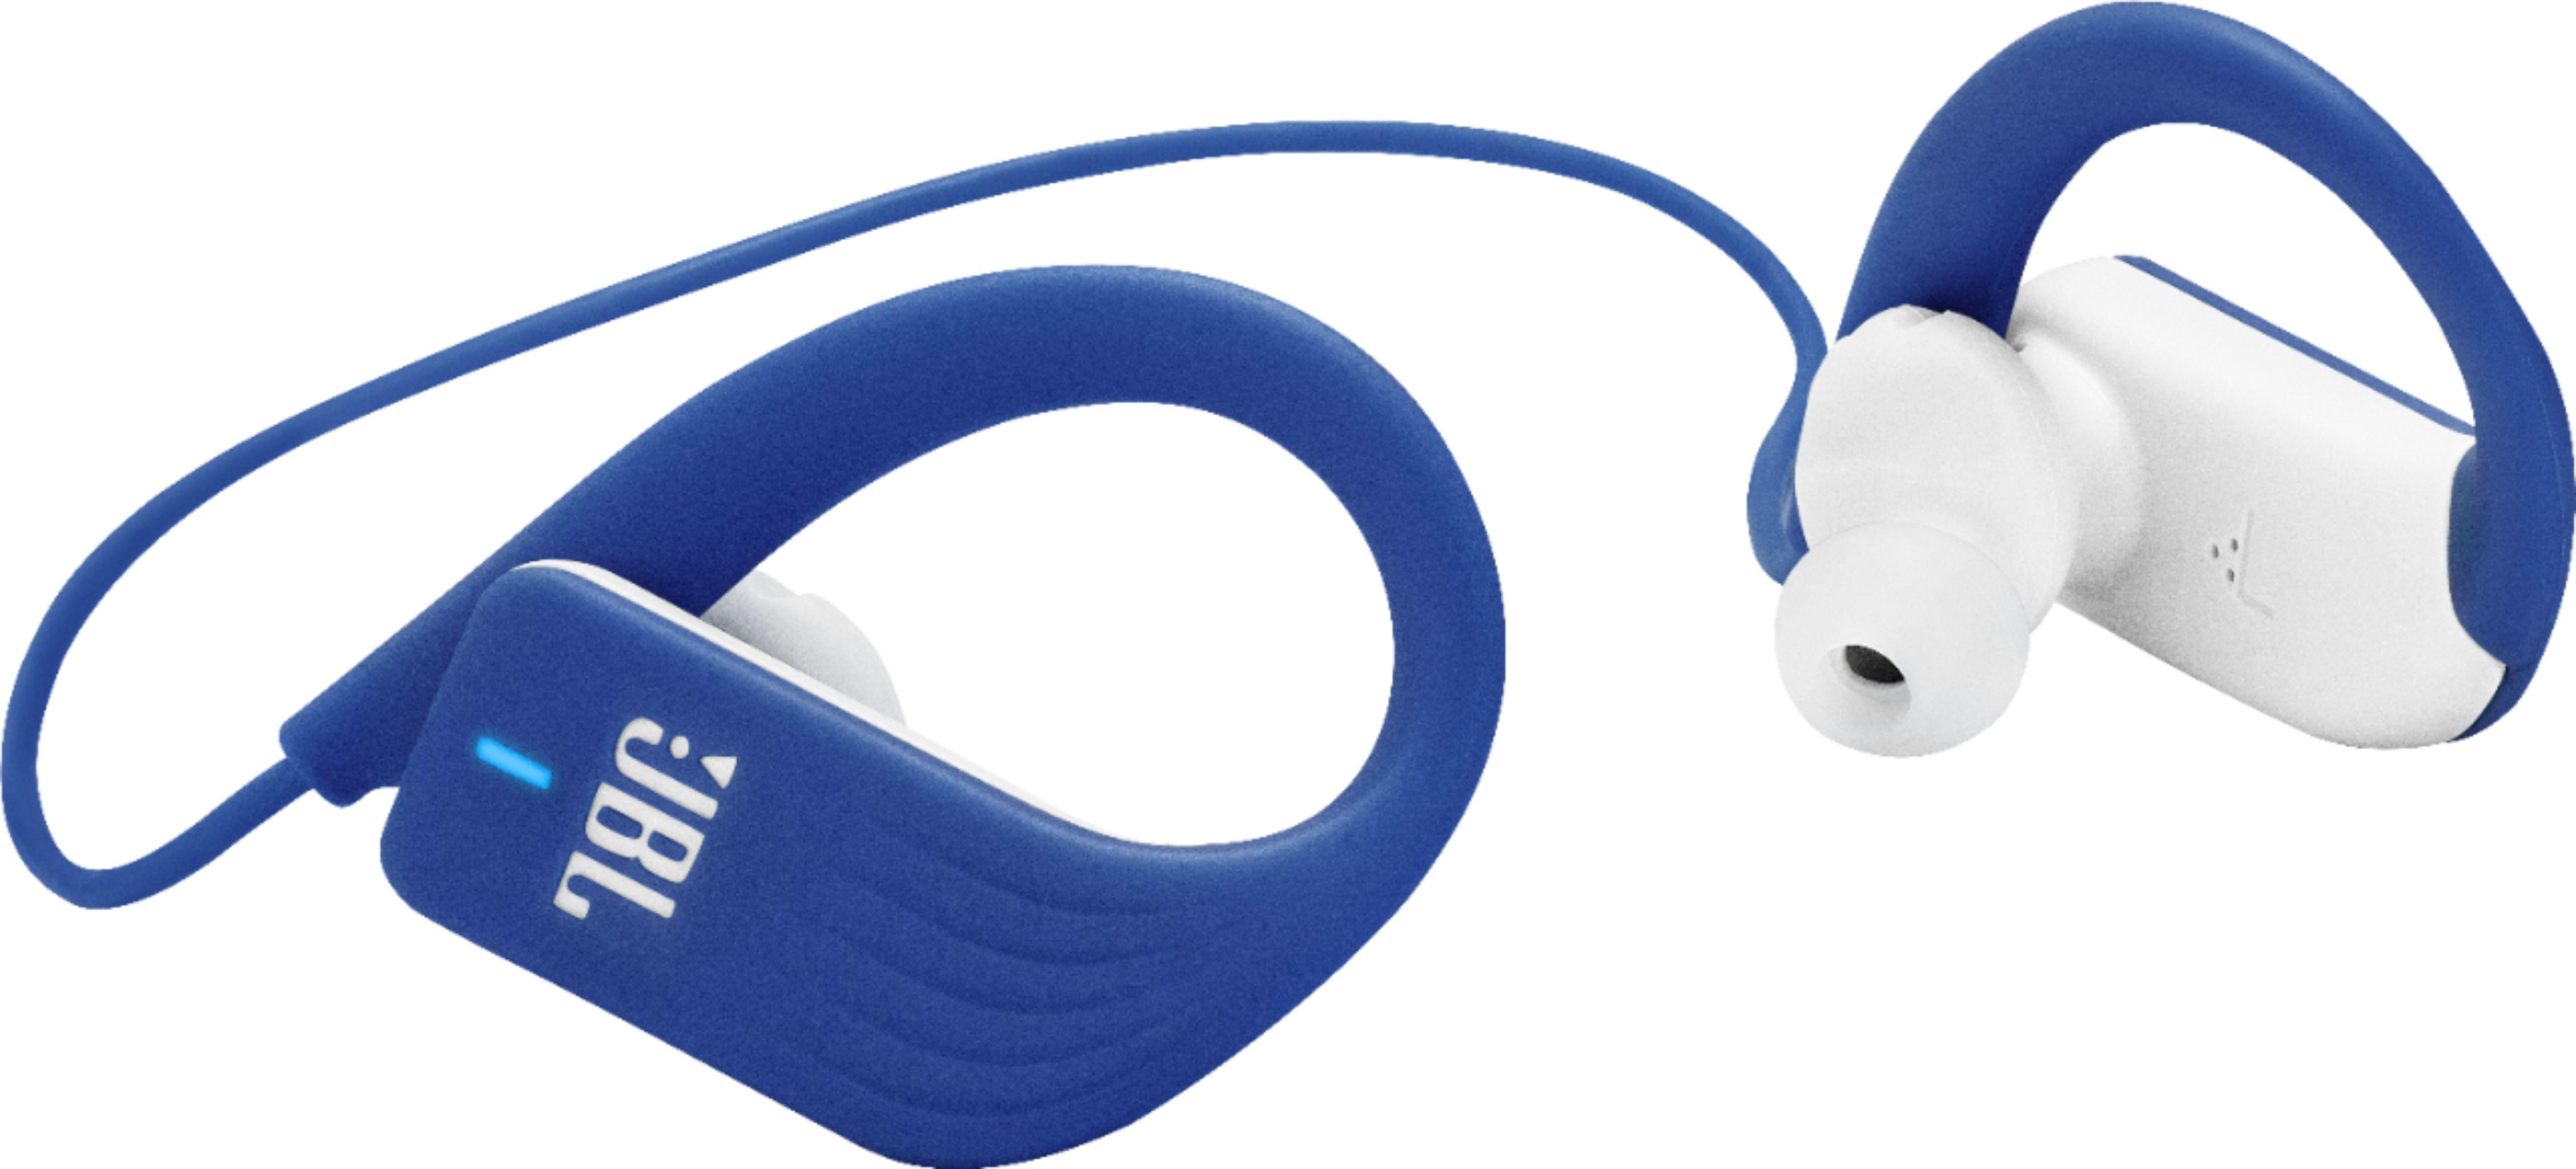 JBL - Endurance Sprint Wireless In-Ear Headphones - Blue $18 $17.99